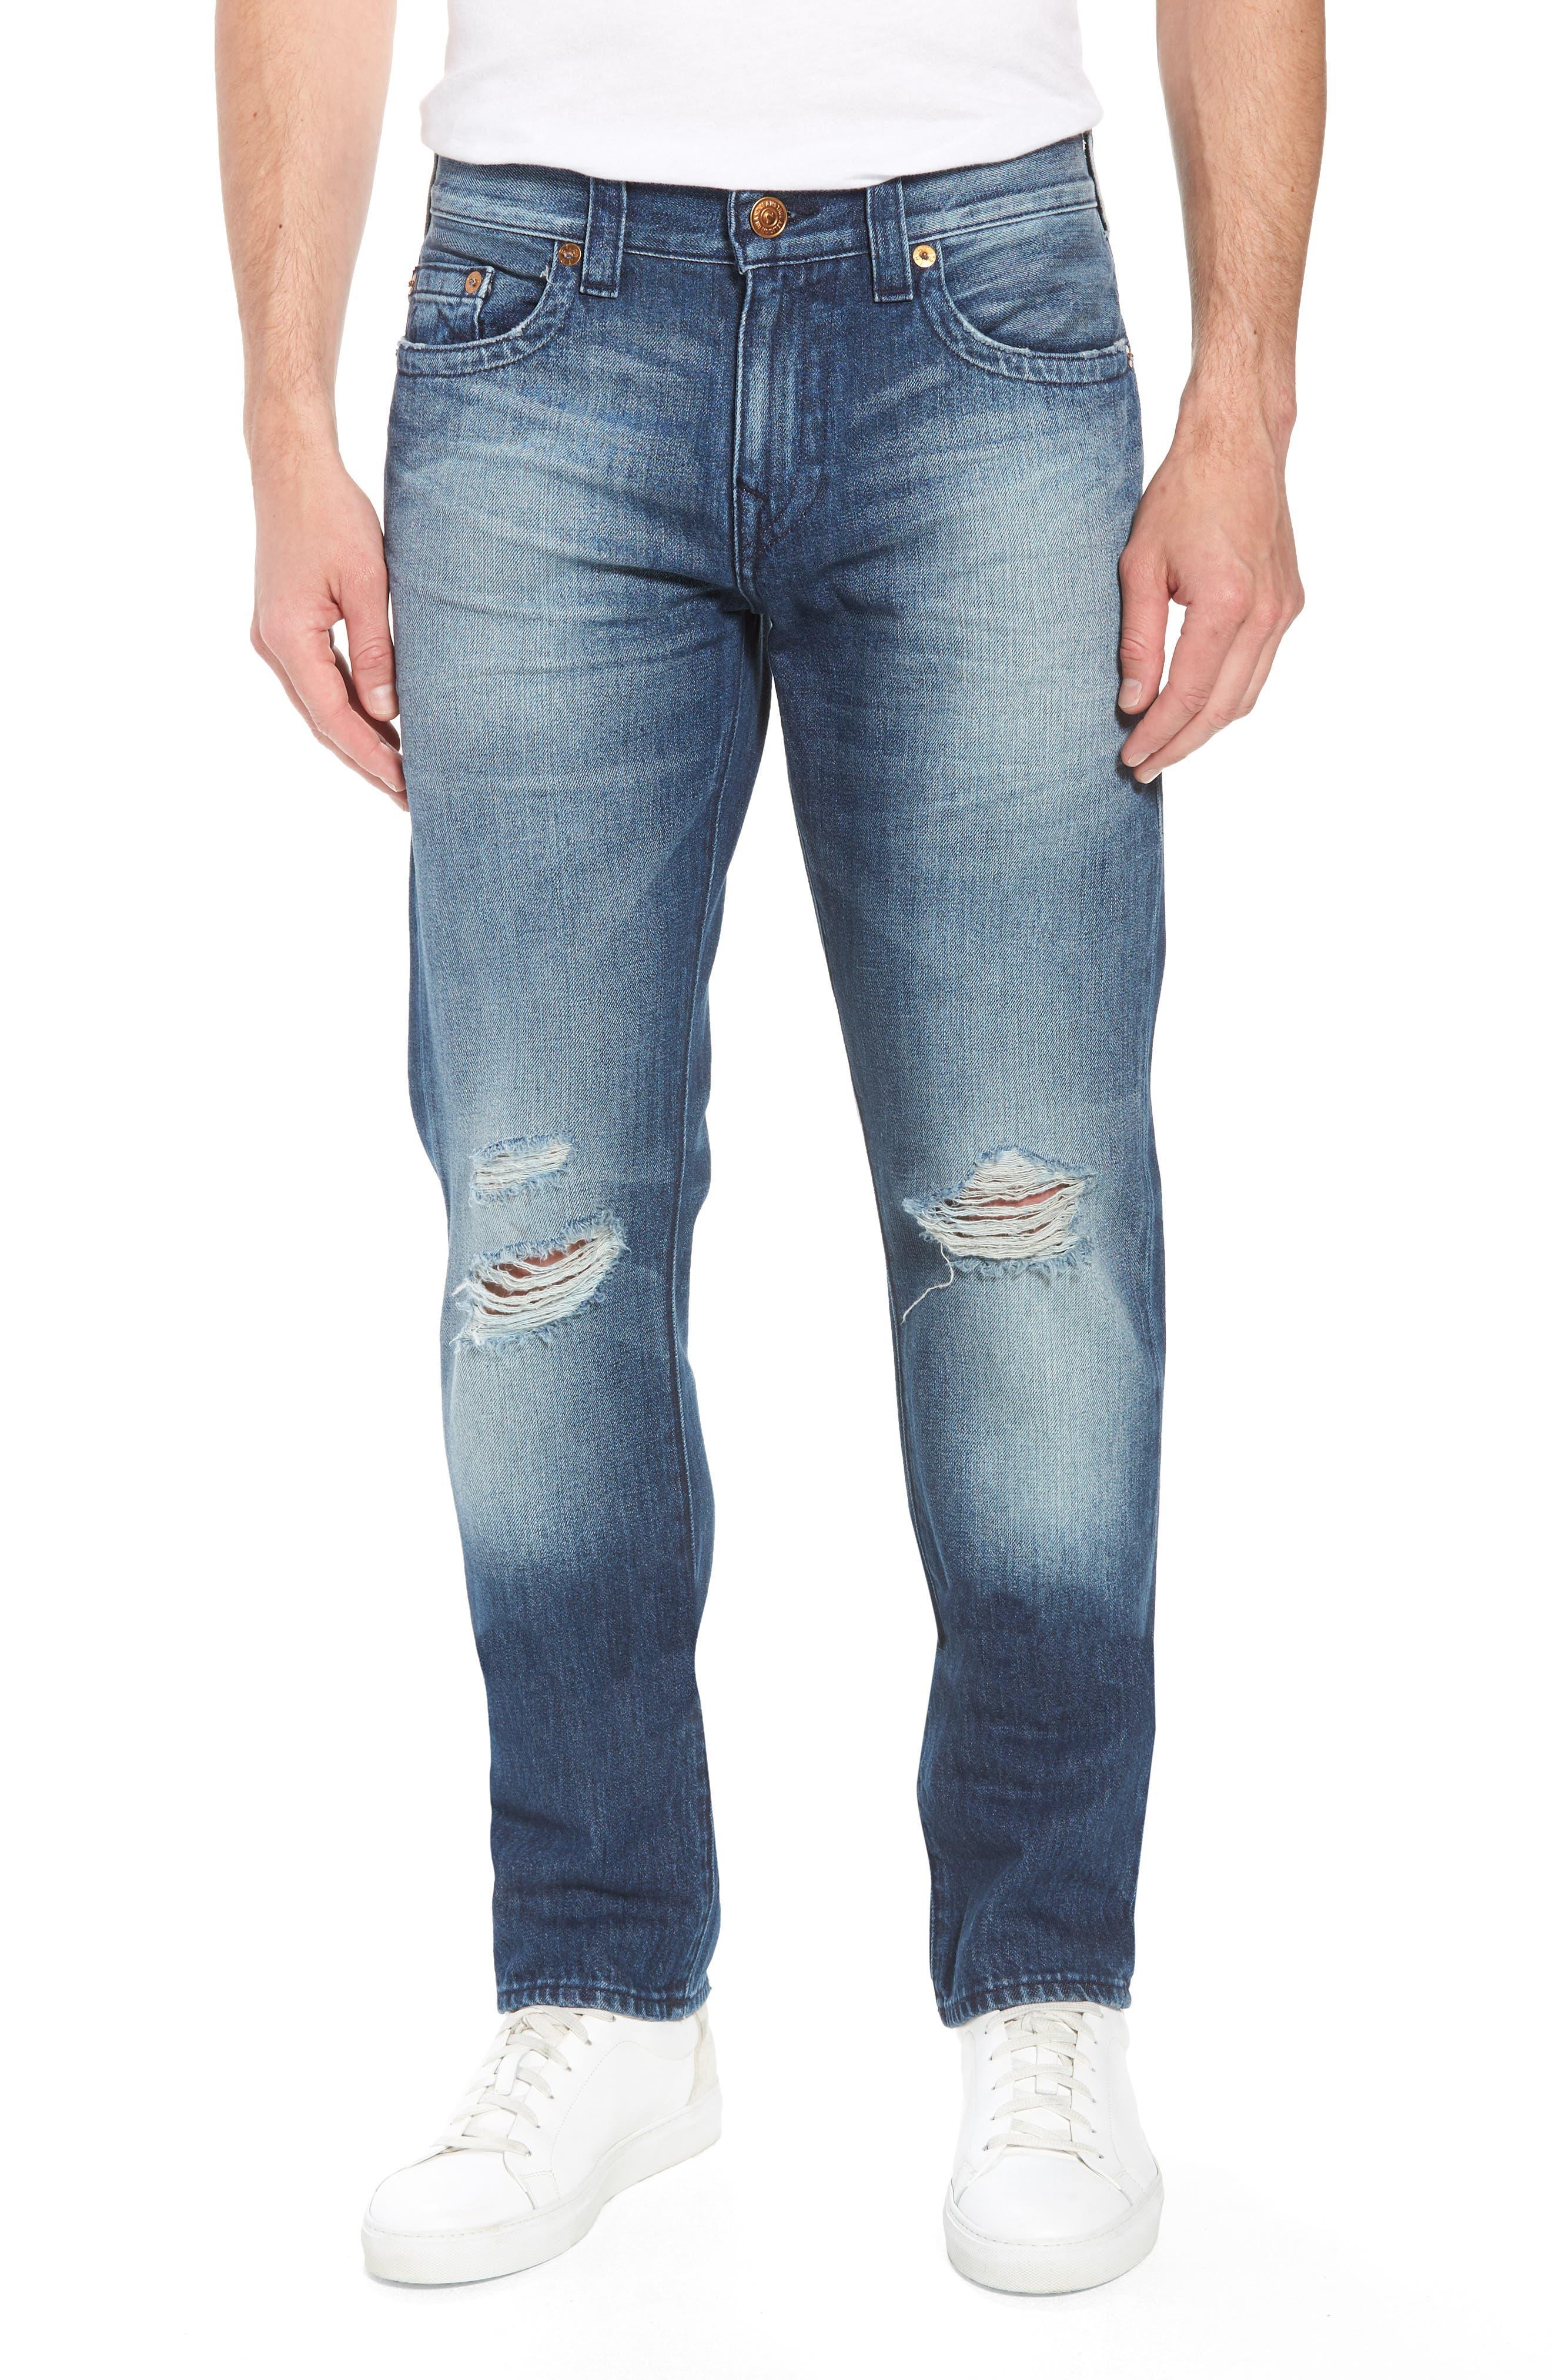 True Religion Brand Jeans Geno Straight Leg Jeans (Worn Suspect)